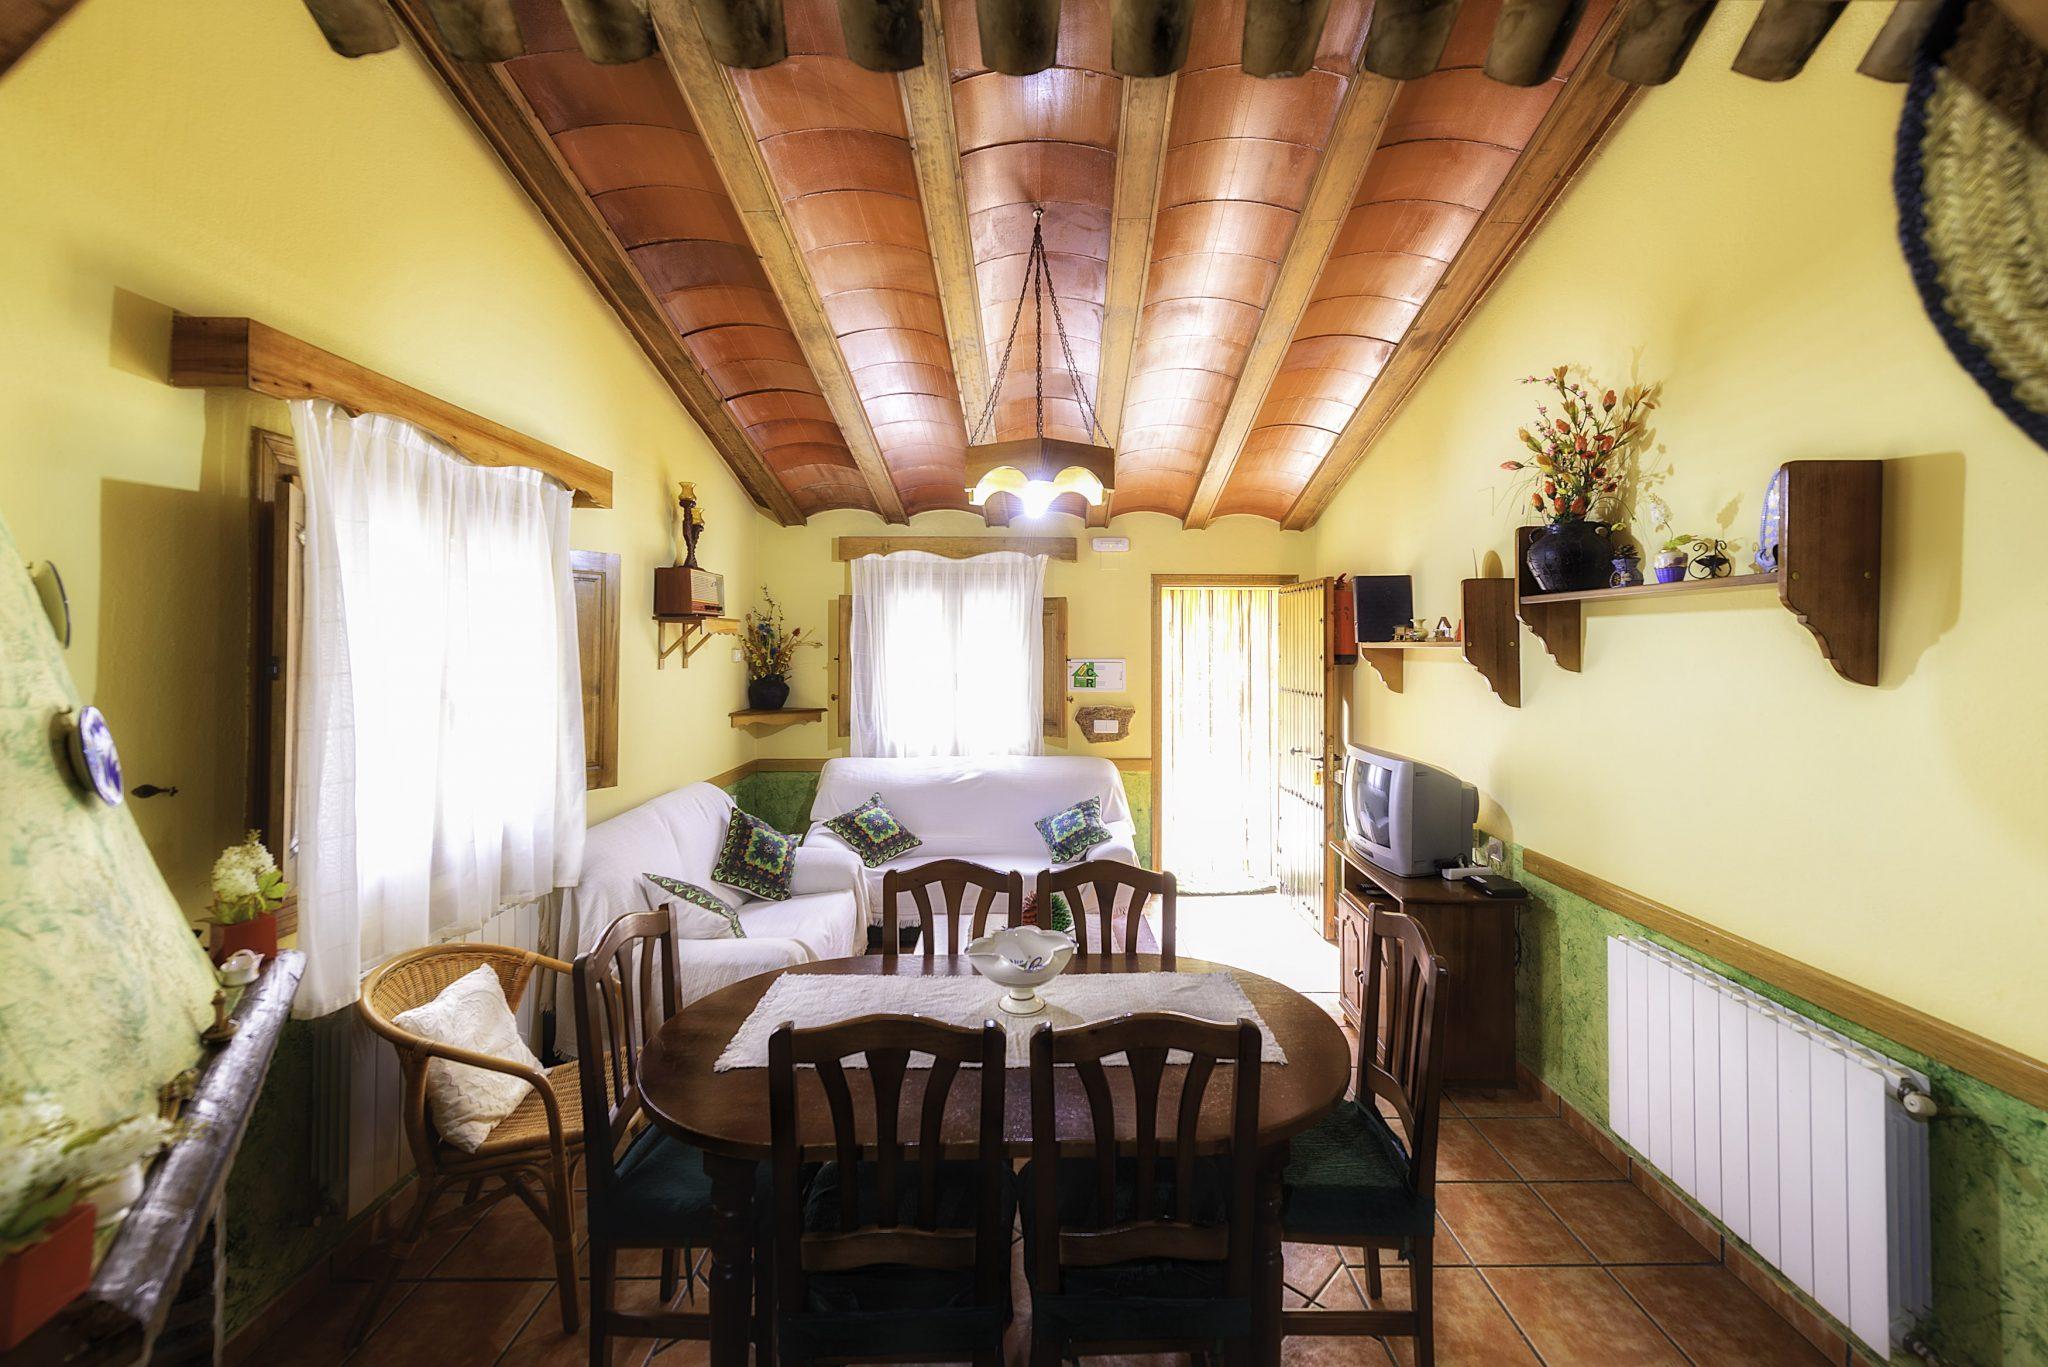 comedor casa 4 imprimir copia-min – Casas Rurales Nerpio